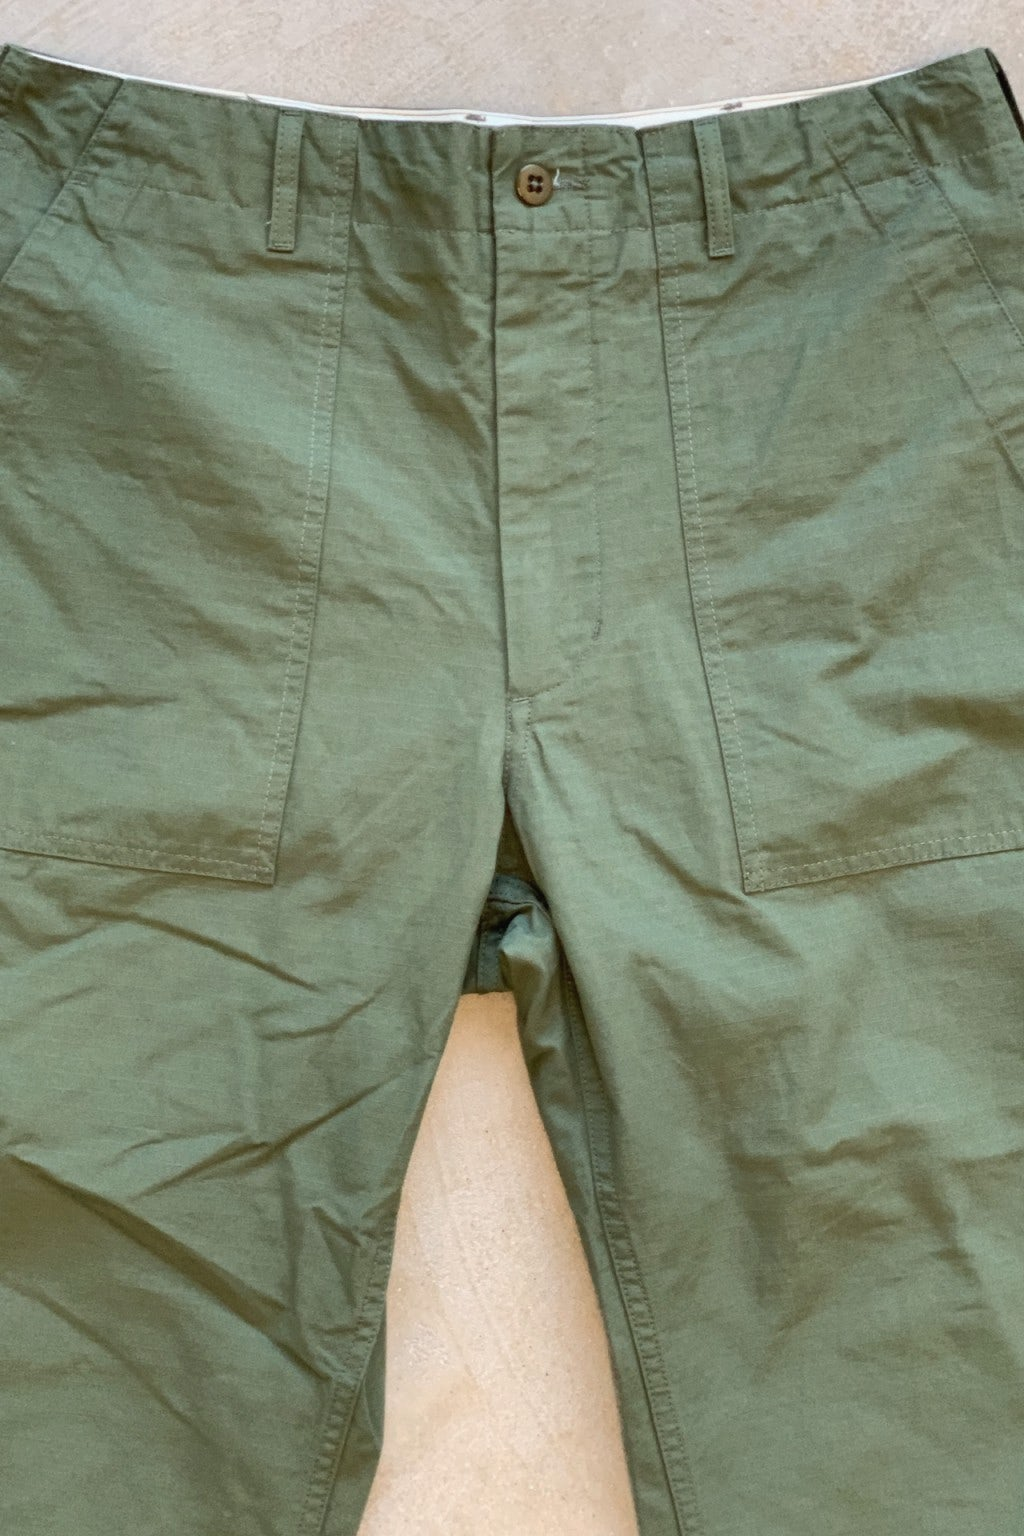 Engineered Garments Fatigue Pant Olive Riptstop